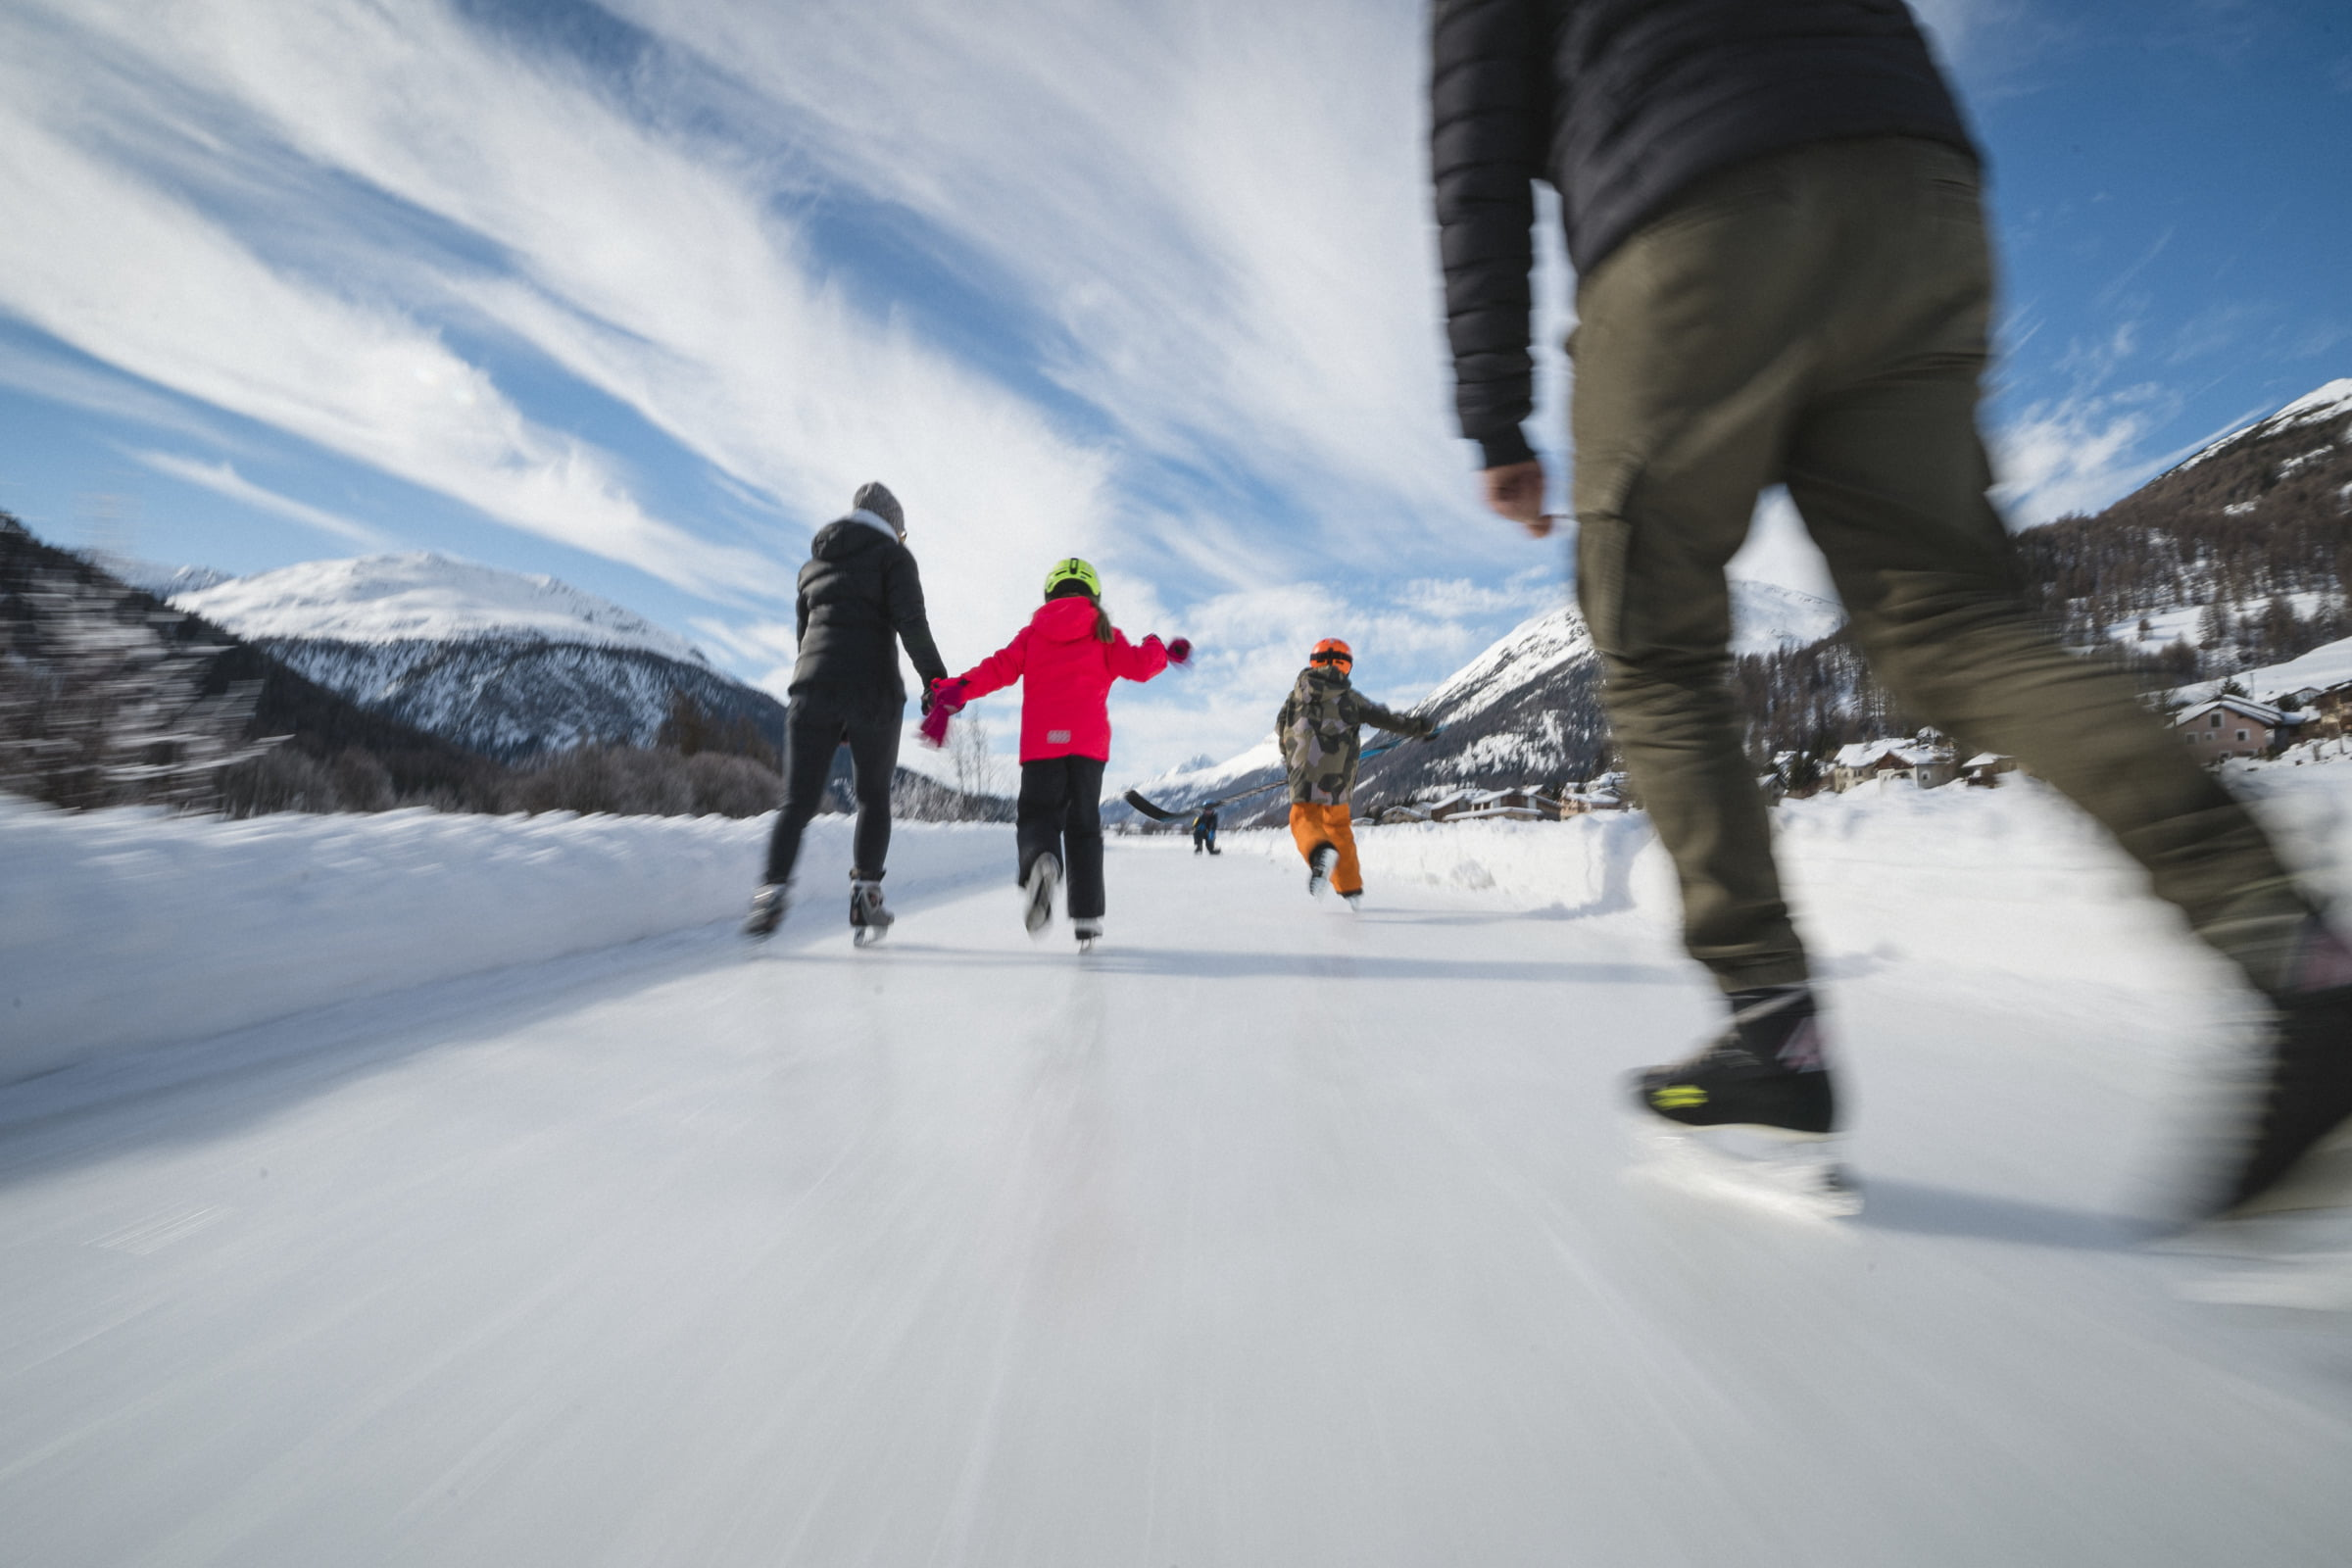 Winter fun for families